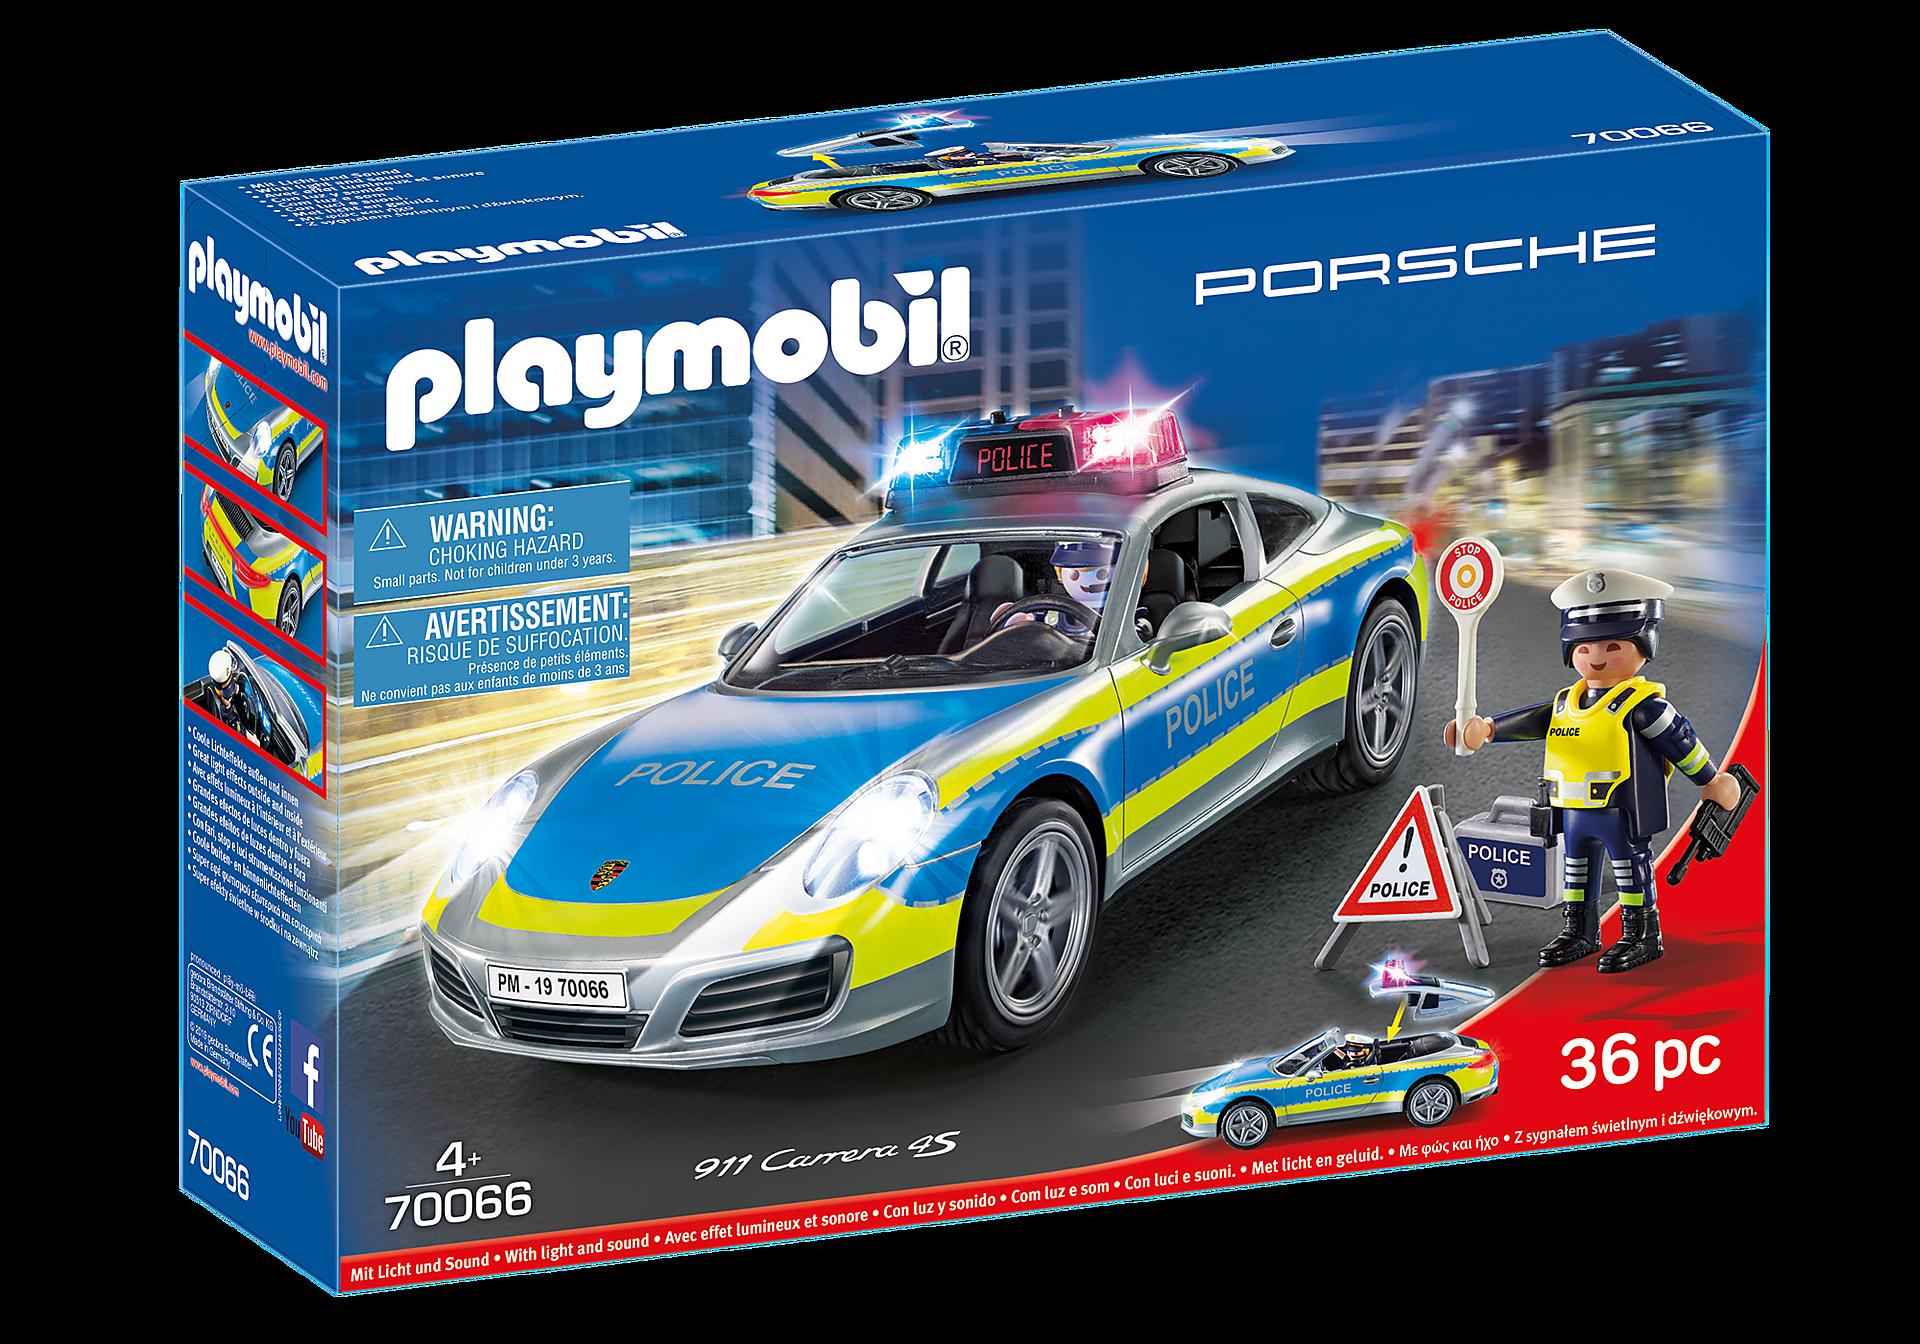 70066 Porsche 911 Carrera 4S Policja zoom image3